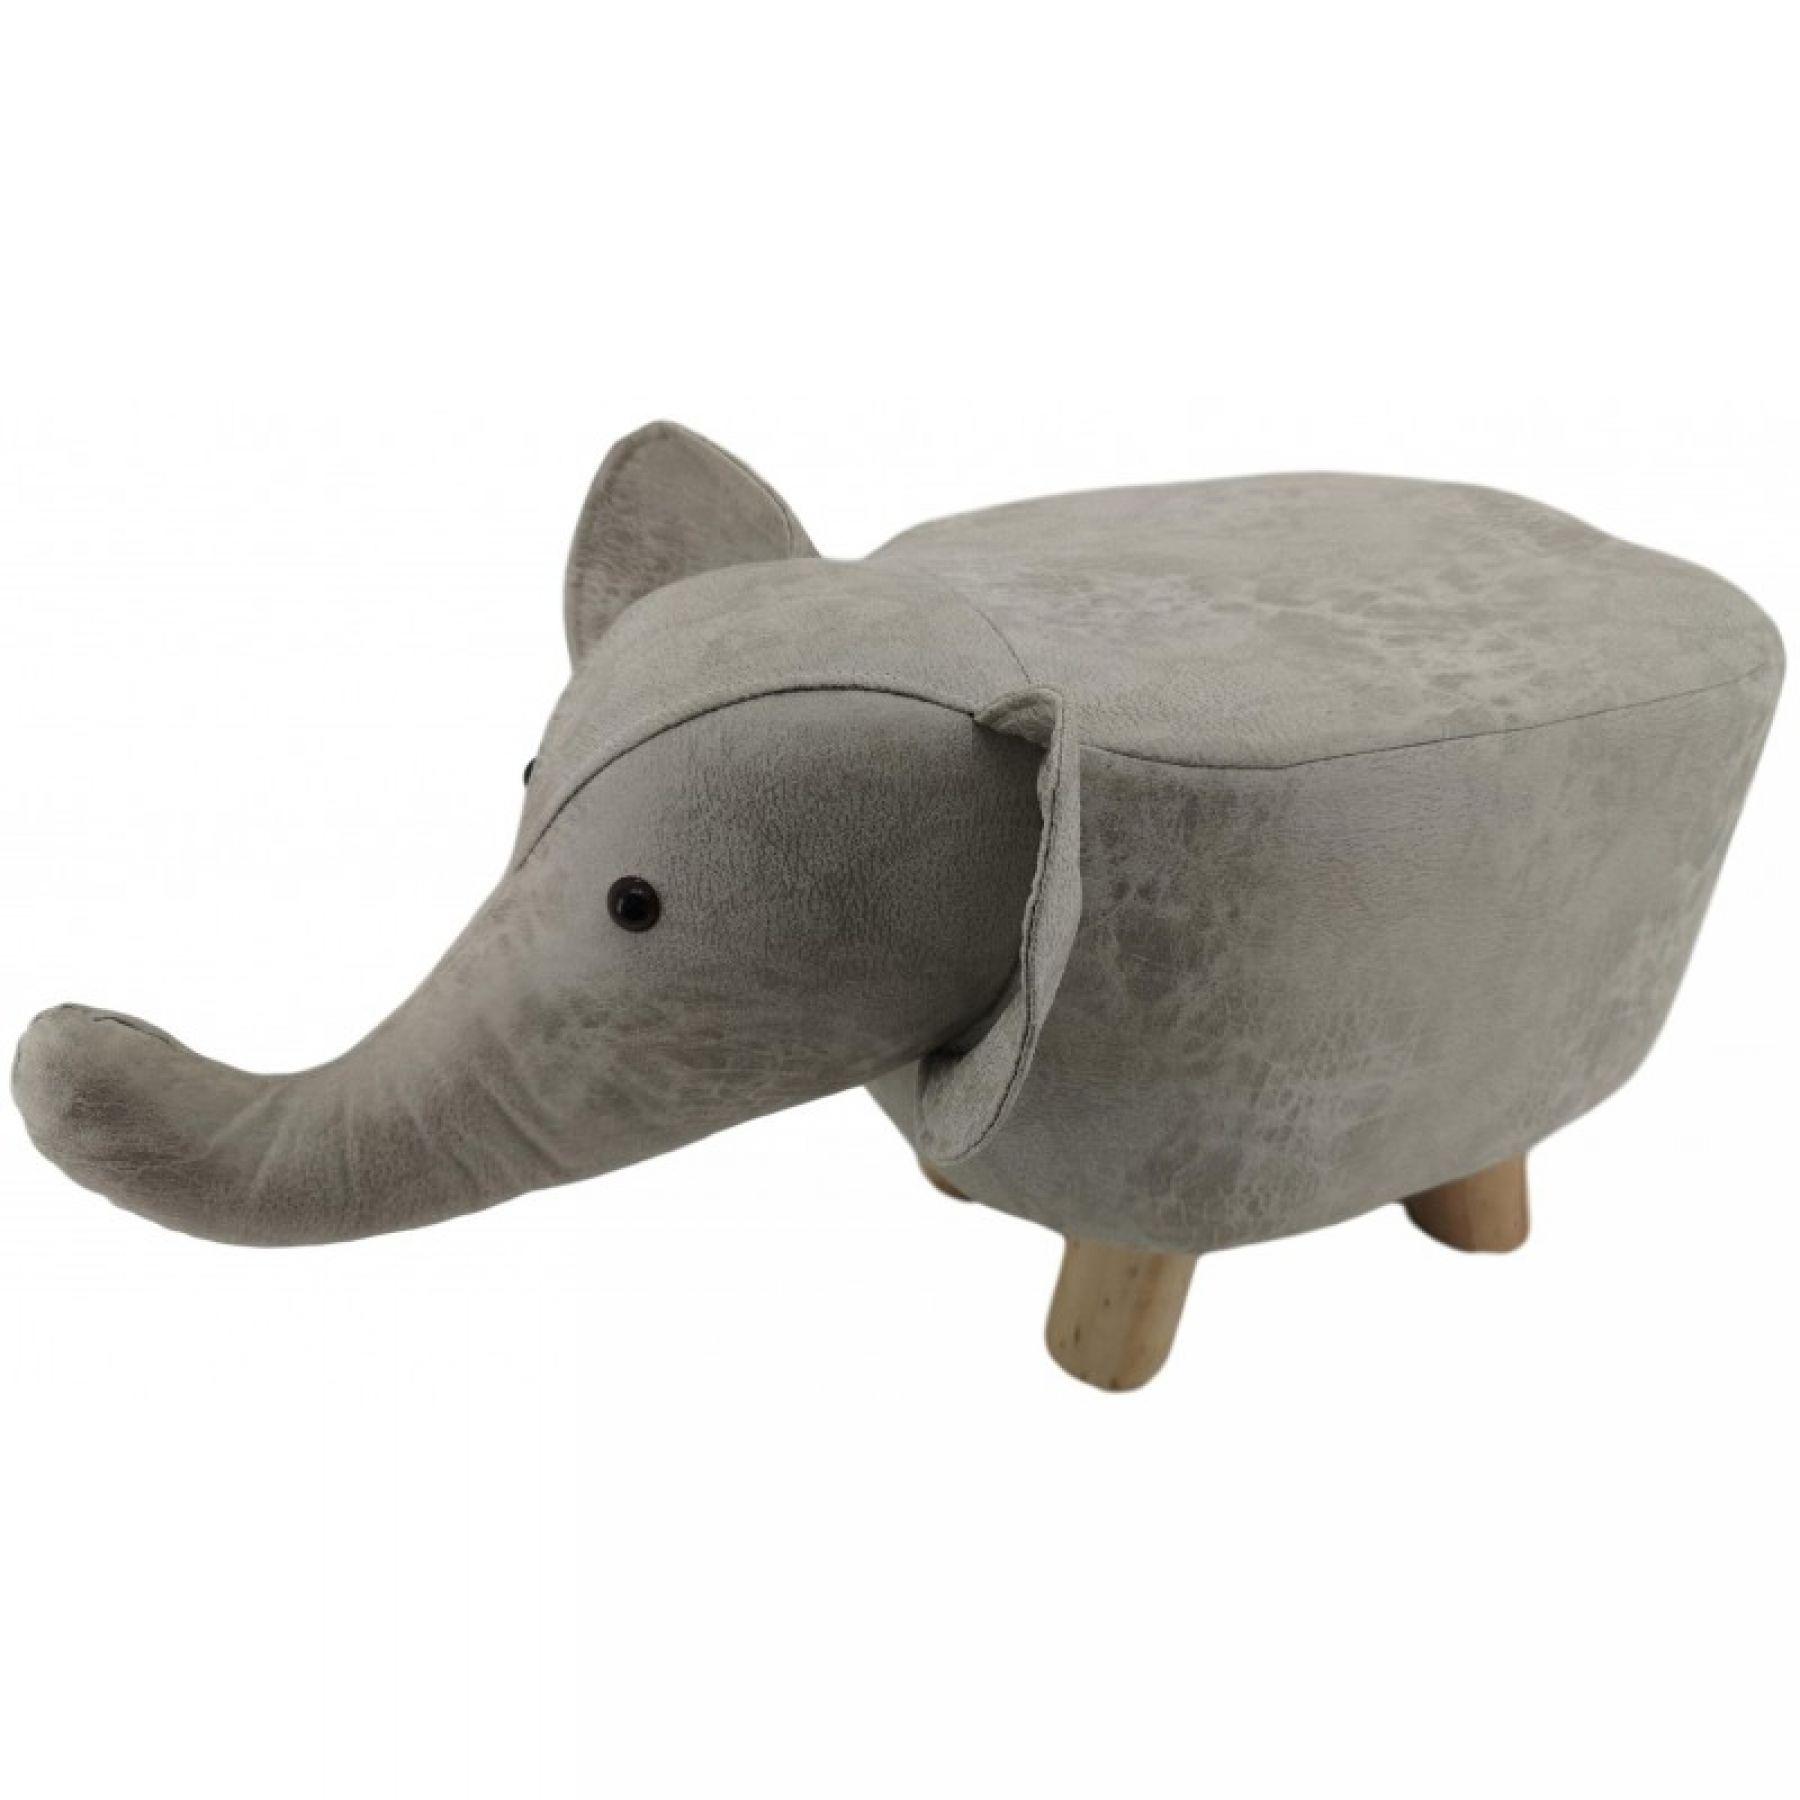 Faux Leather Children's Elephant Stool